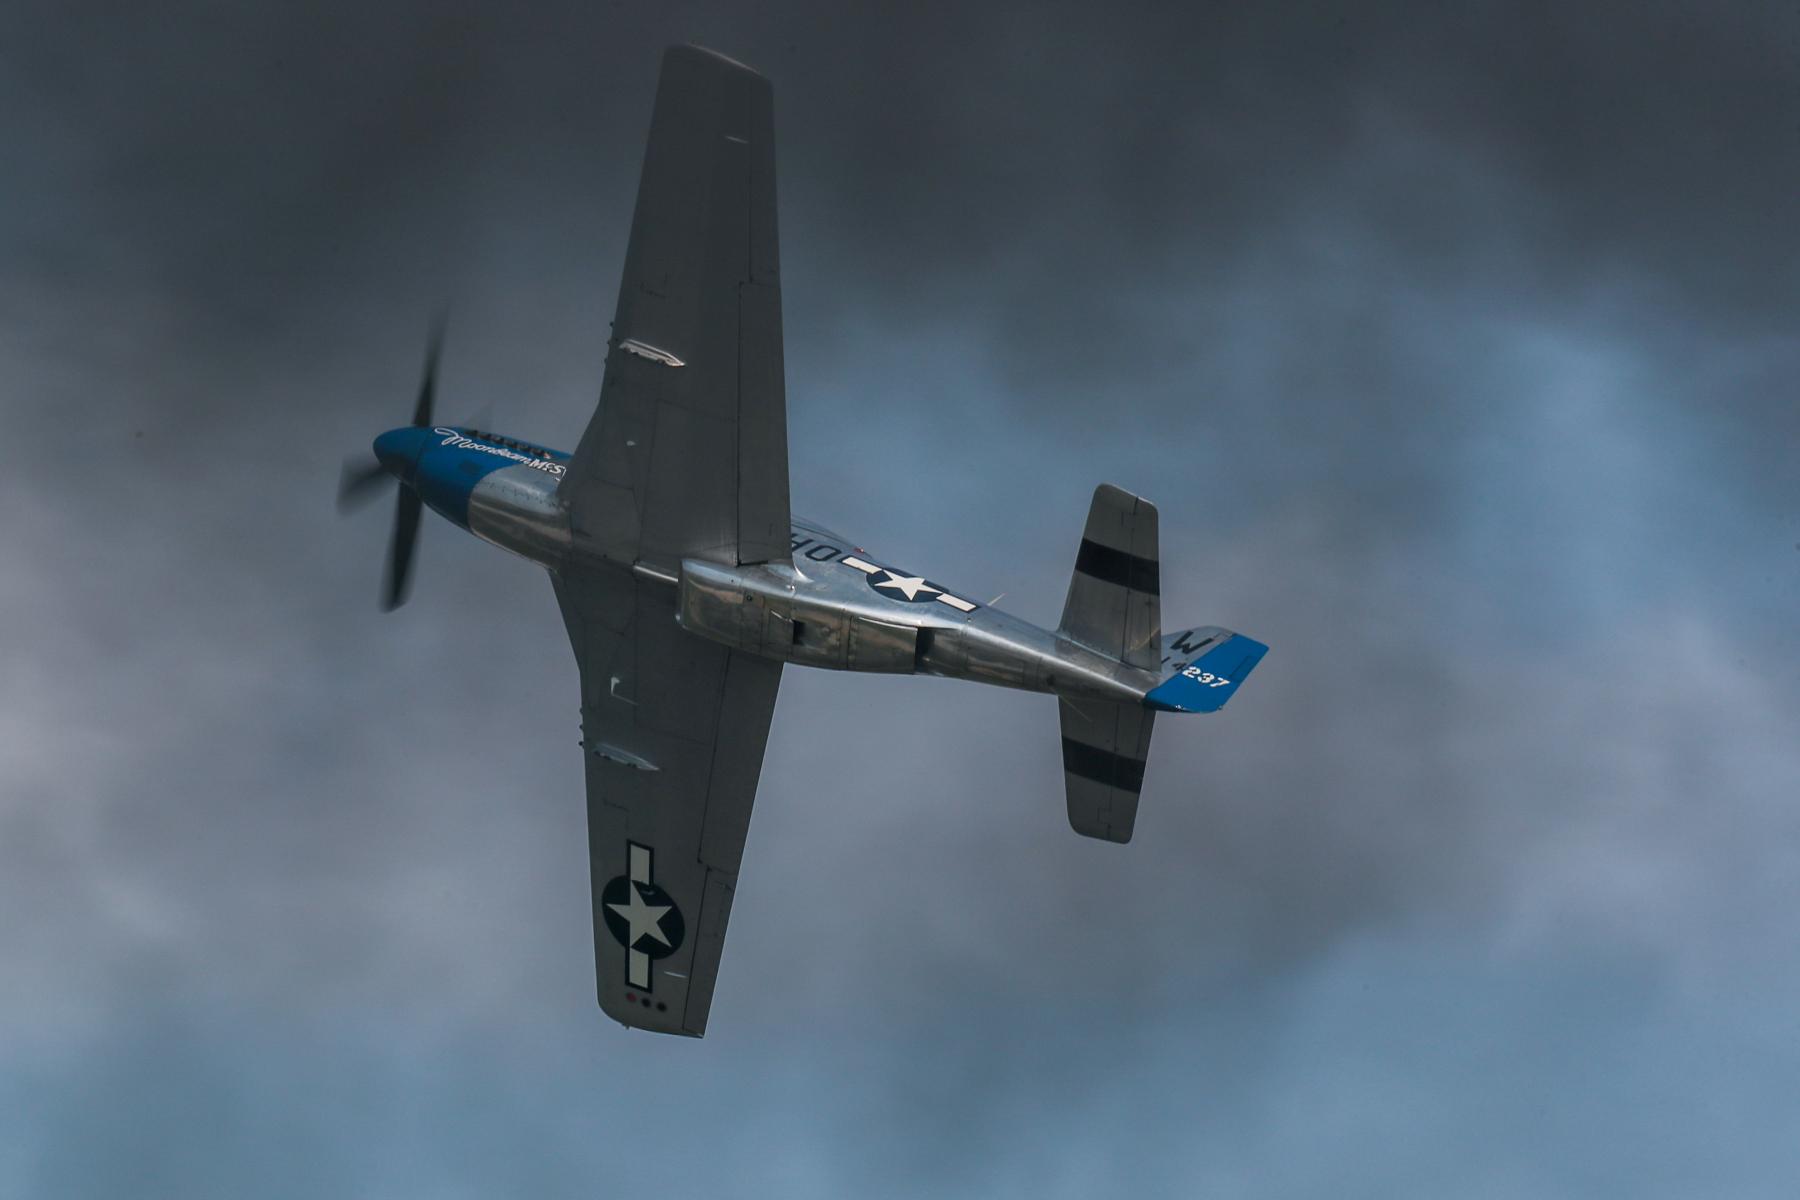 P-51 Mustang by Art Eichmann